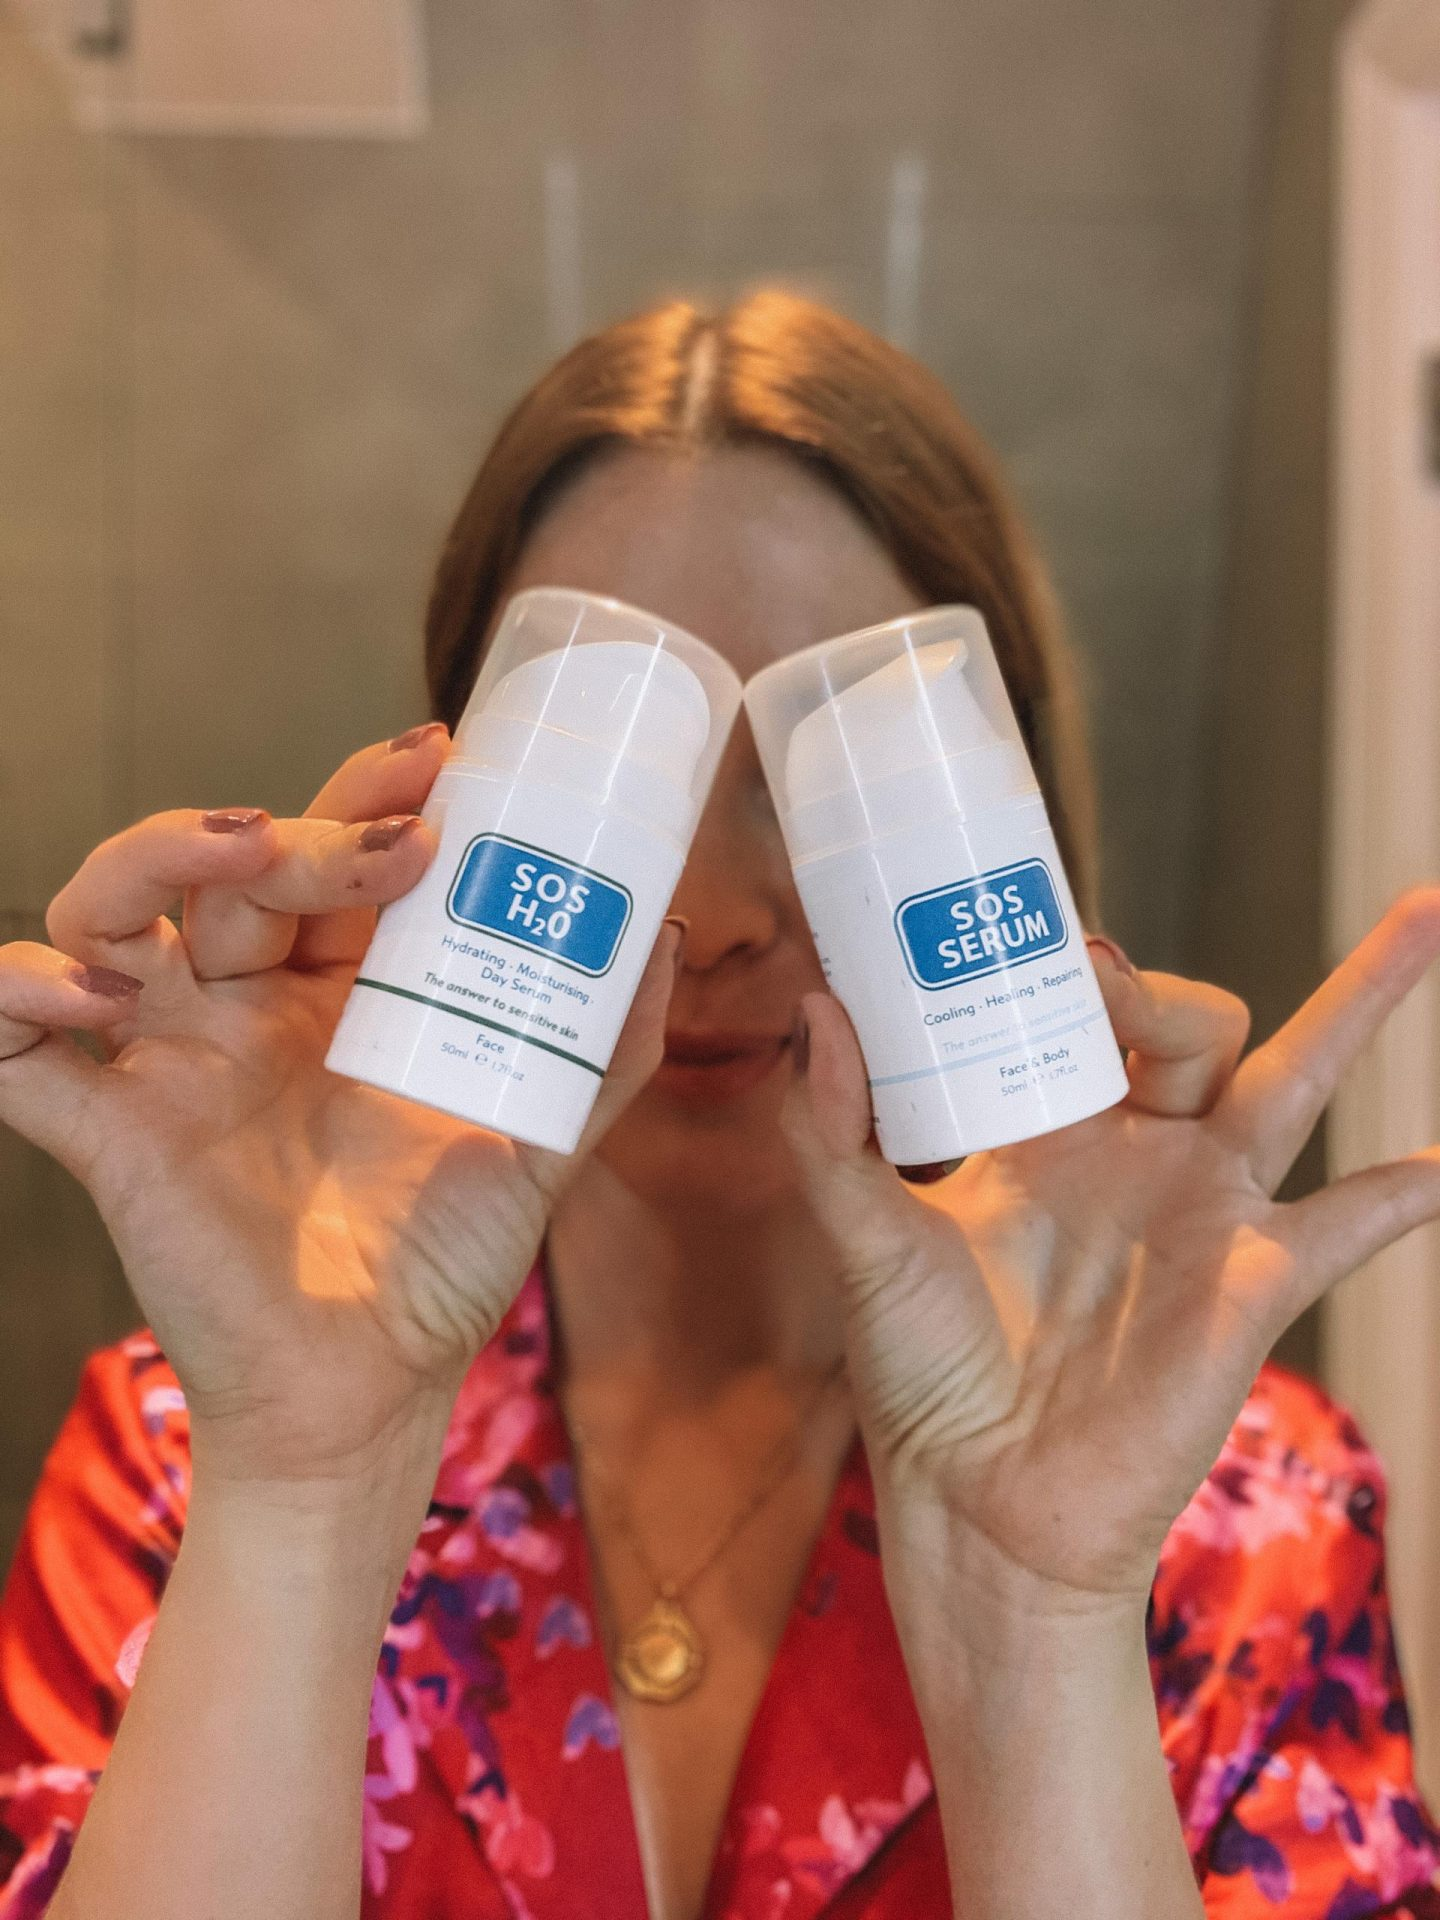 SOS Serum Skincare